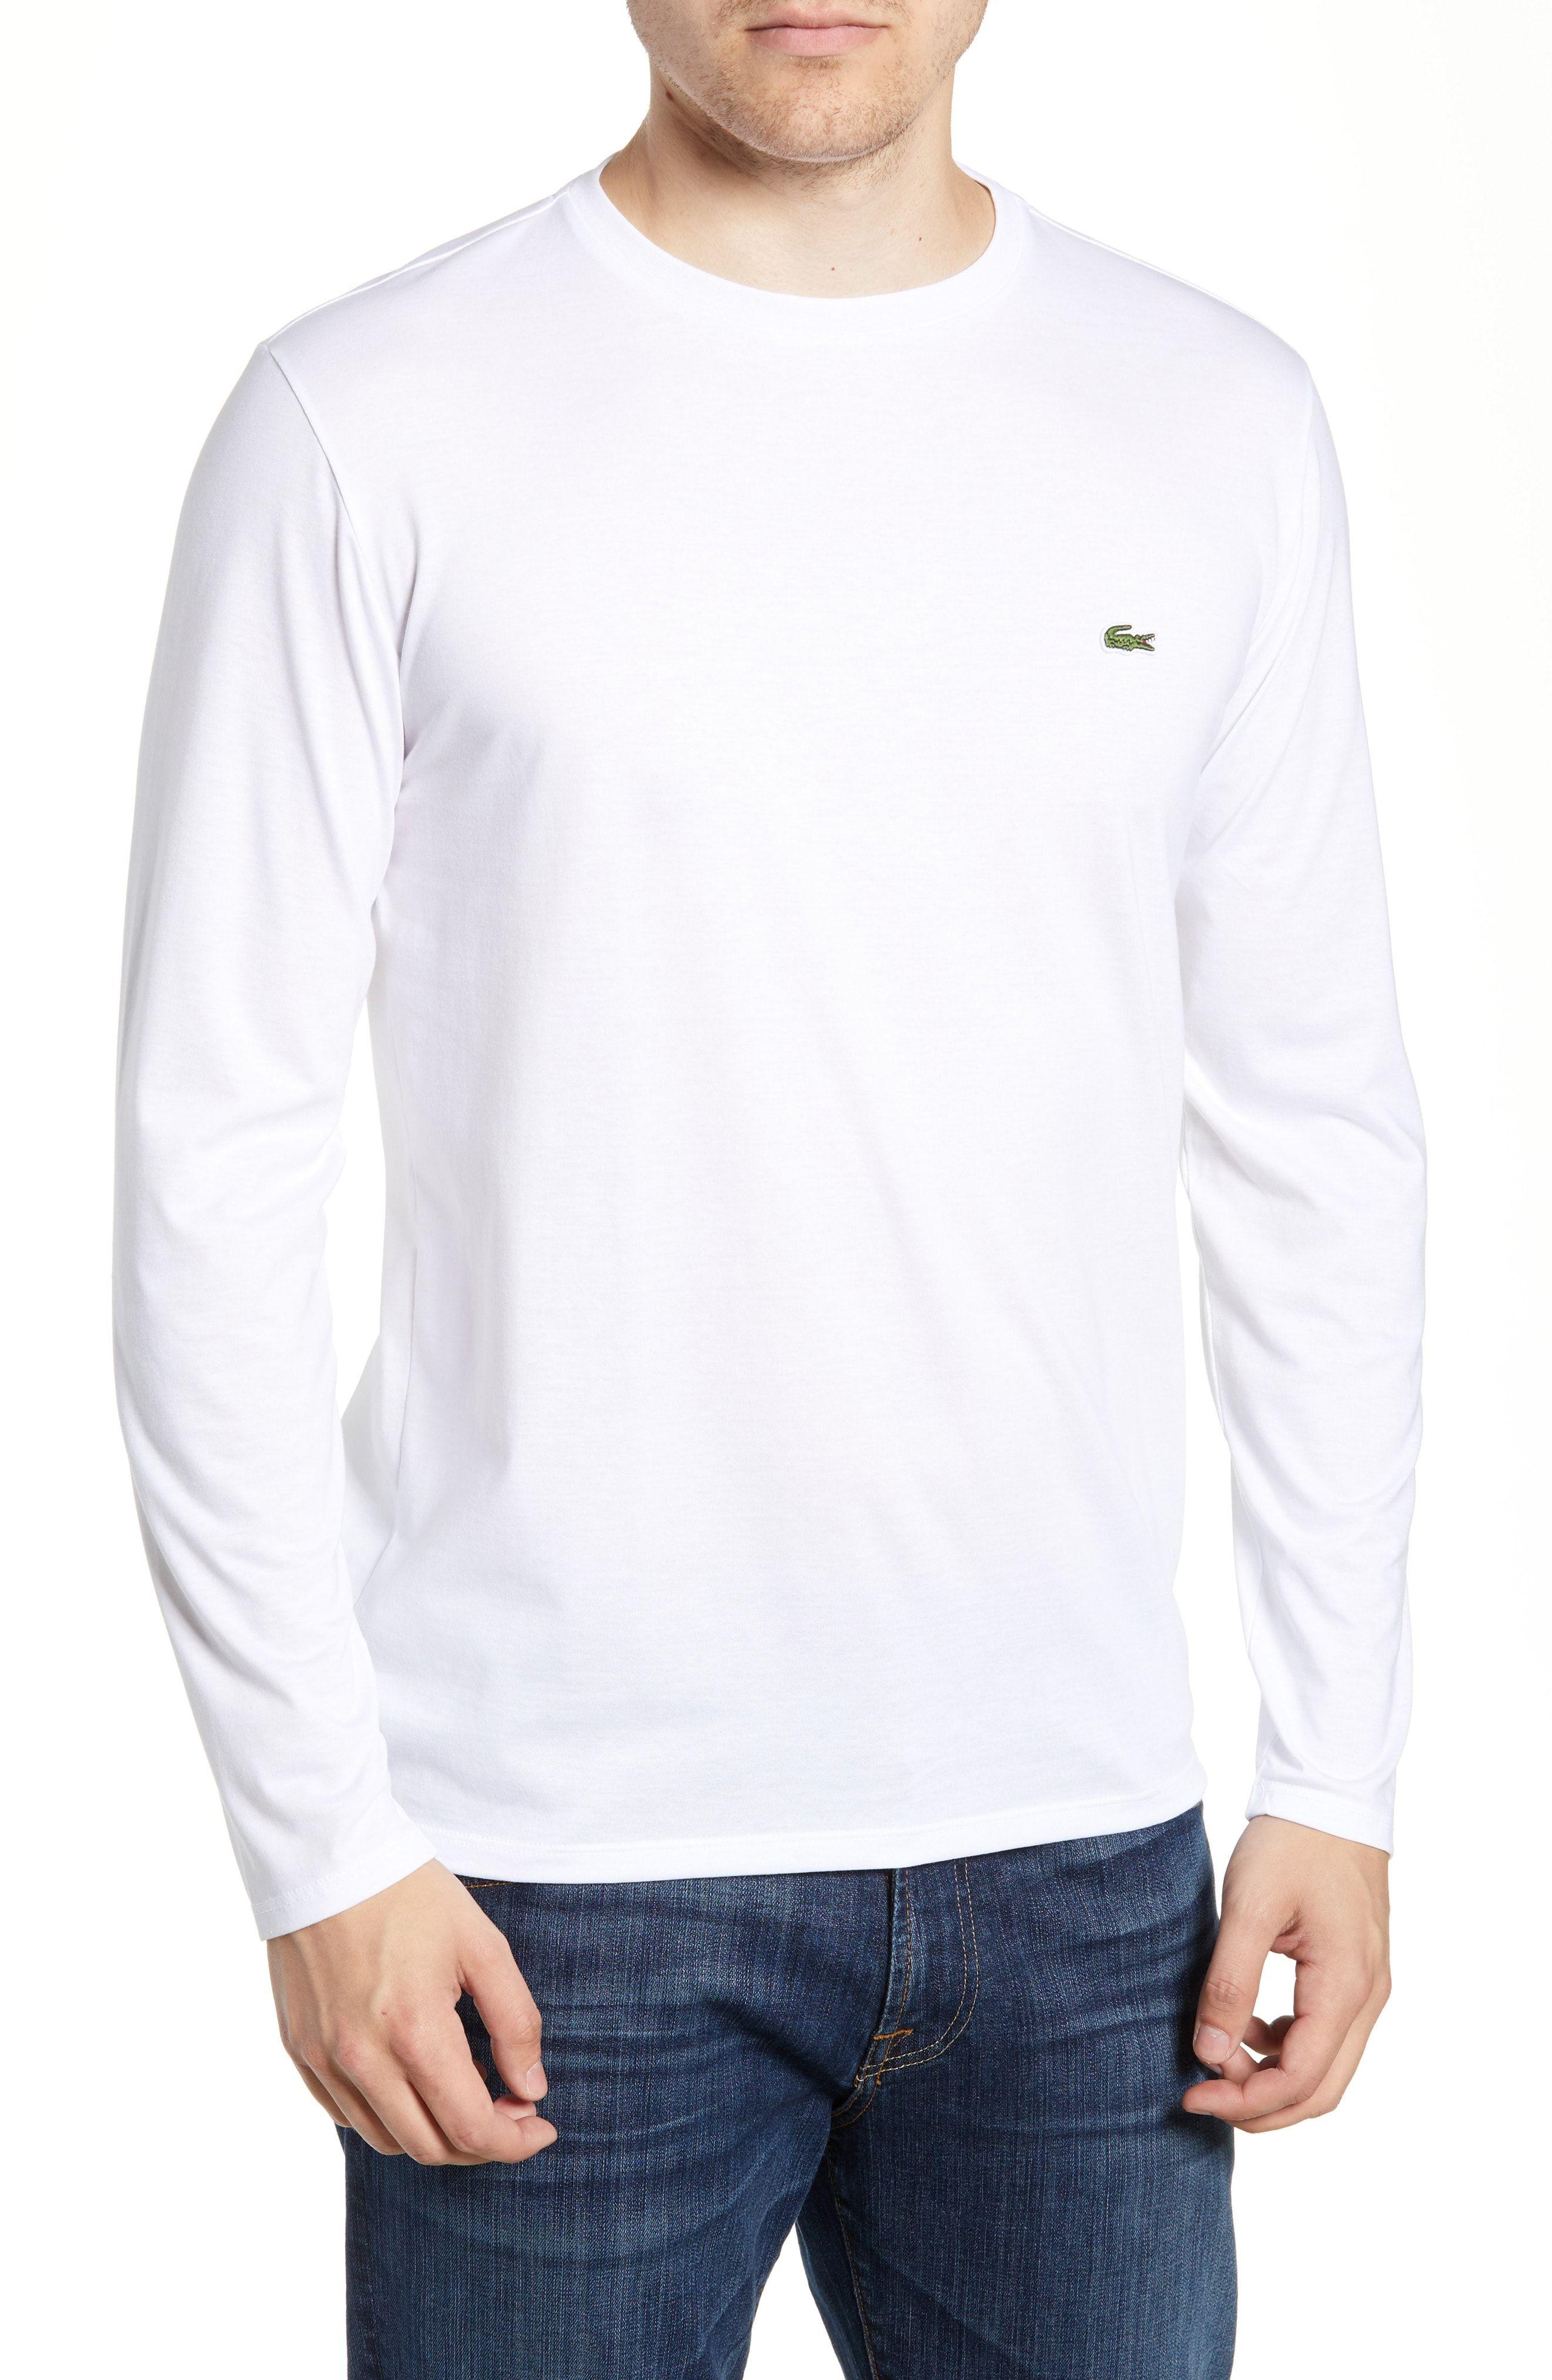 2f70eaa3 Pima Cotton Long Sleeve T Shirts Mens   Saddha